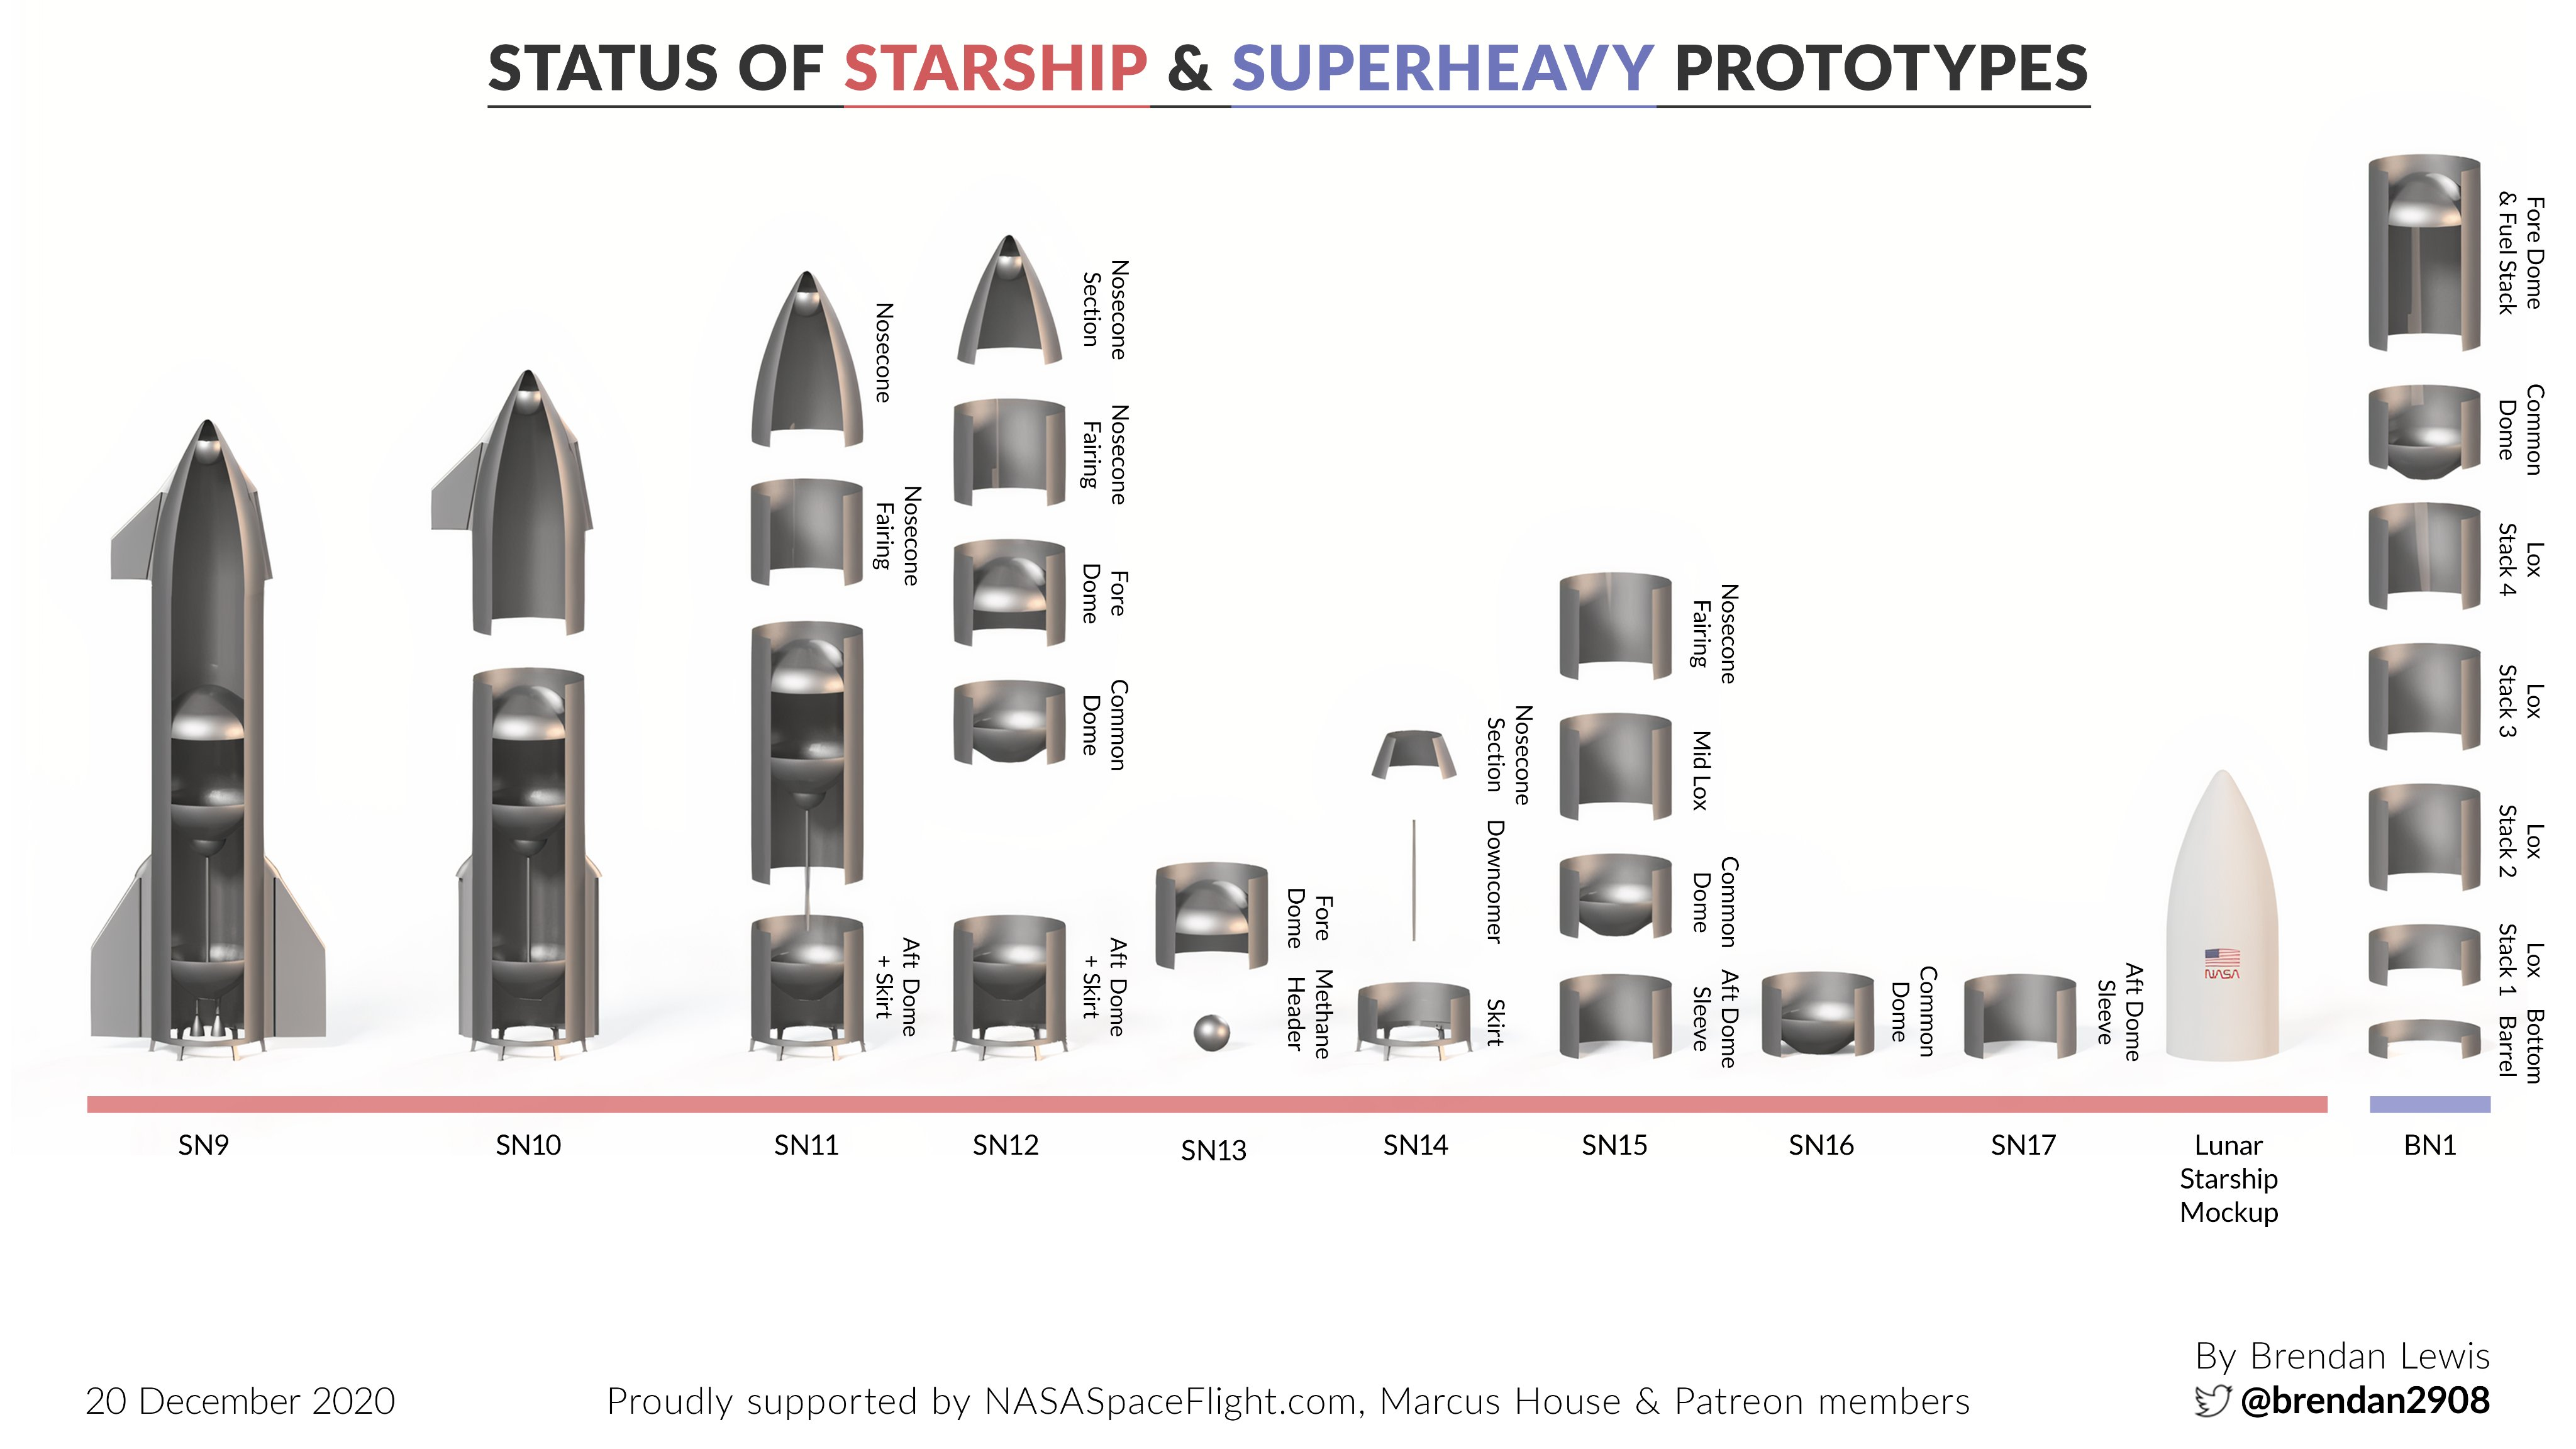 Point de situation des Starship & Superheavy 11681